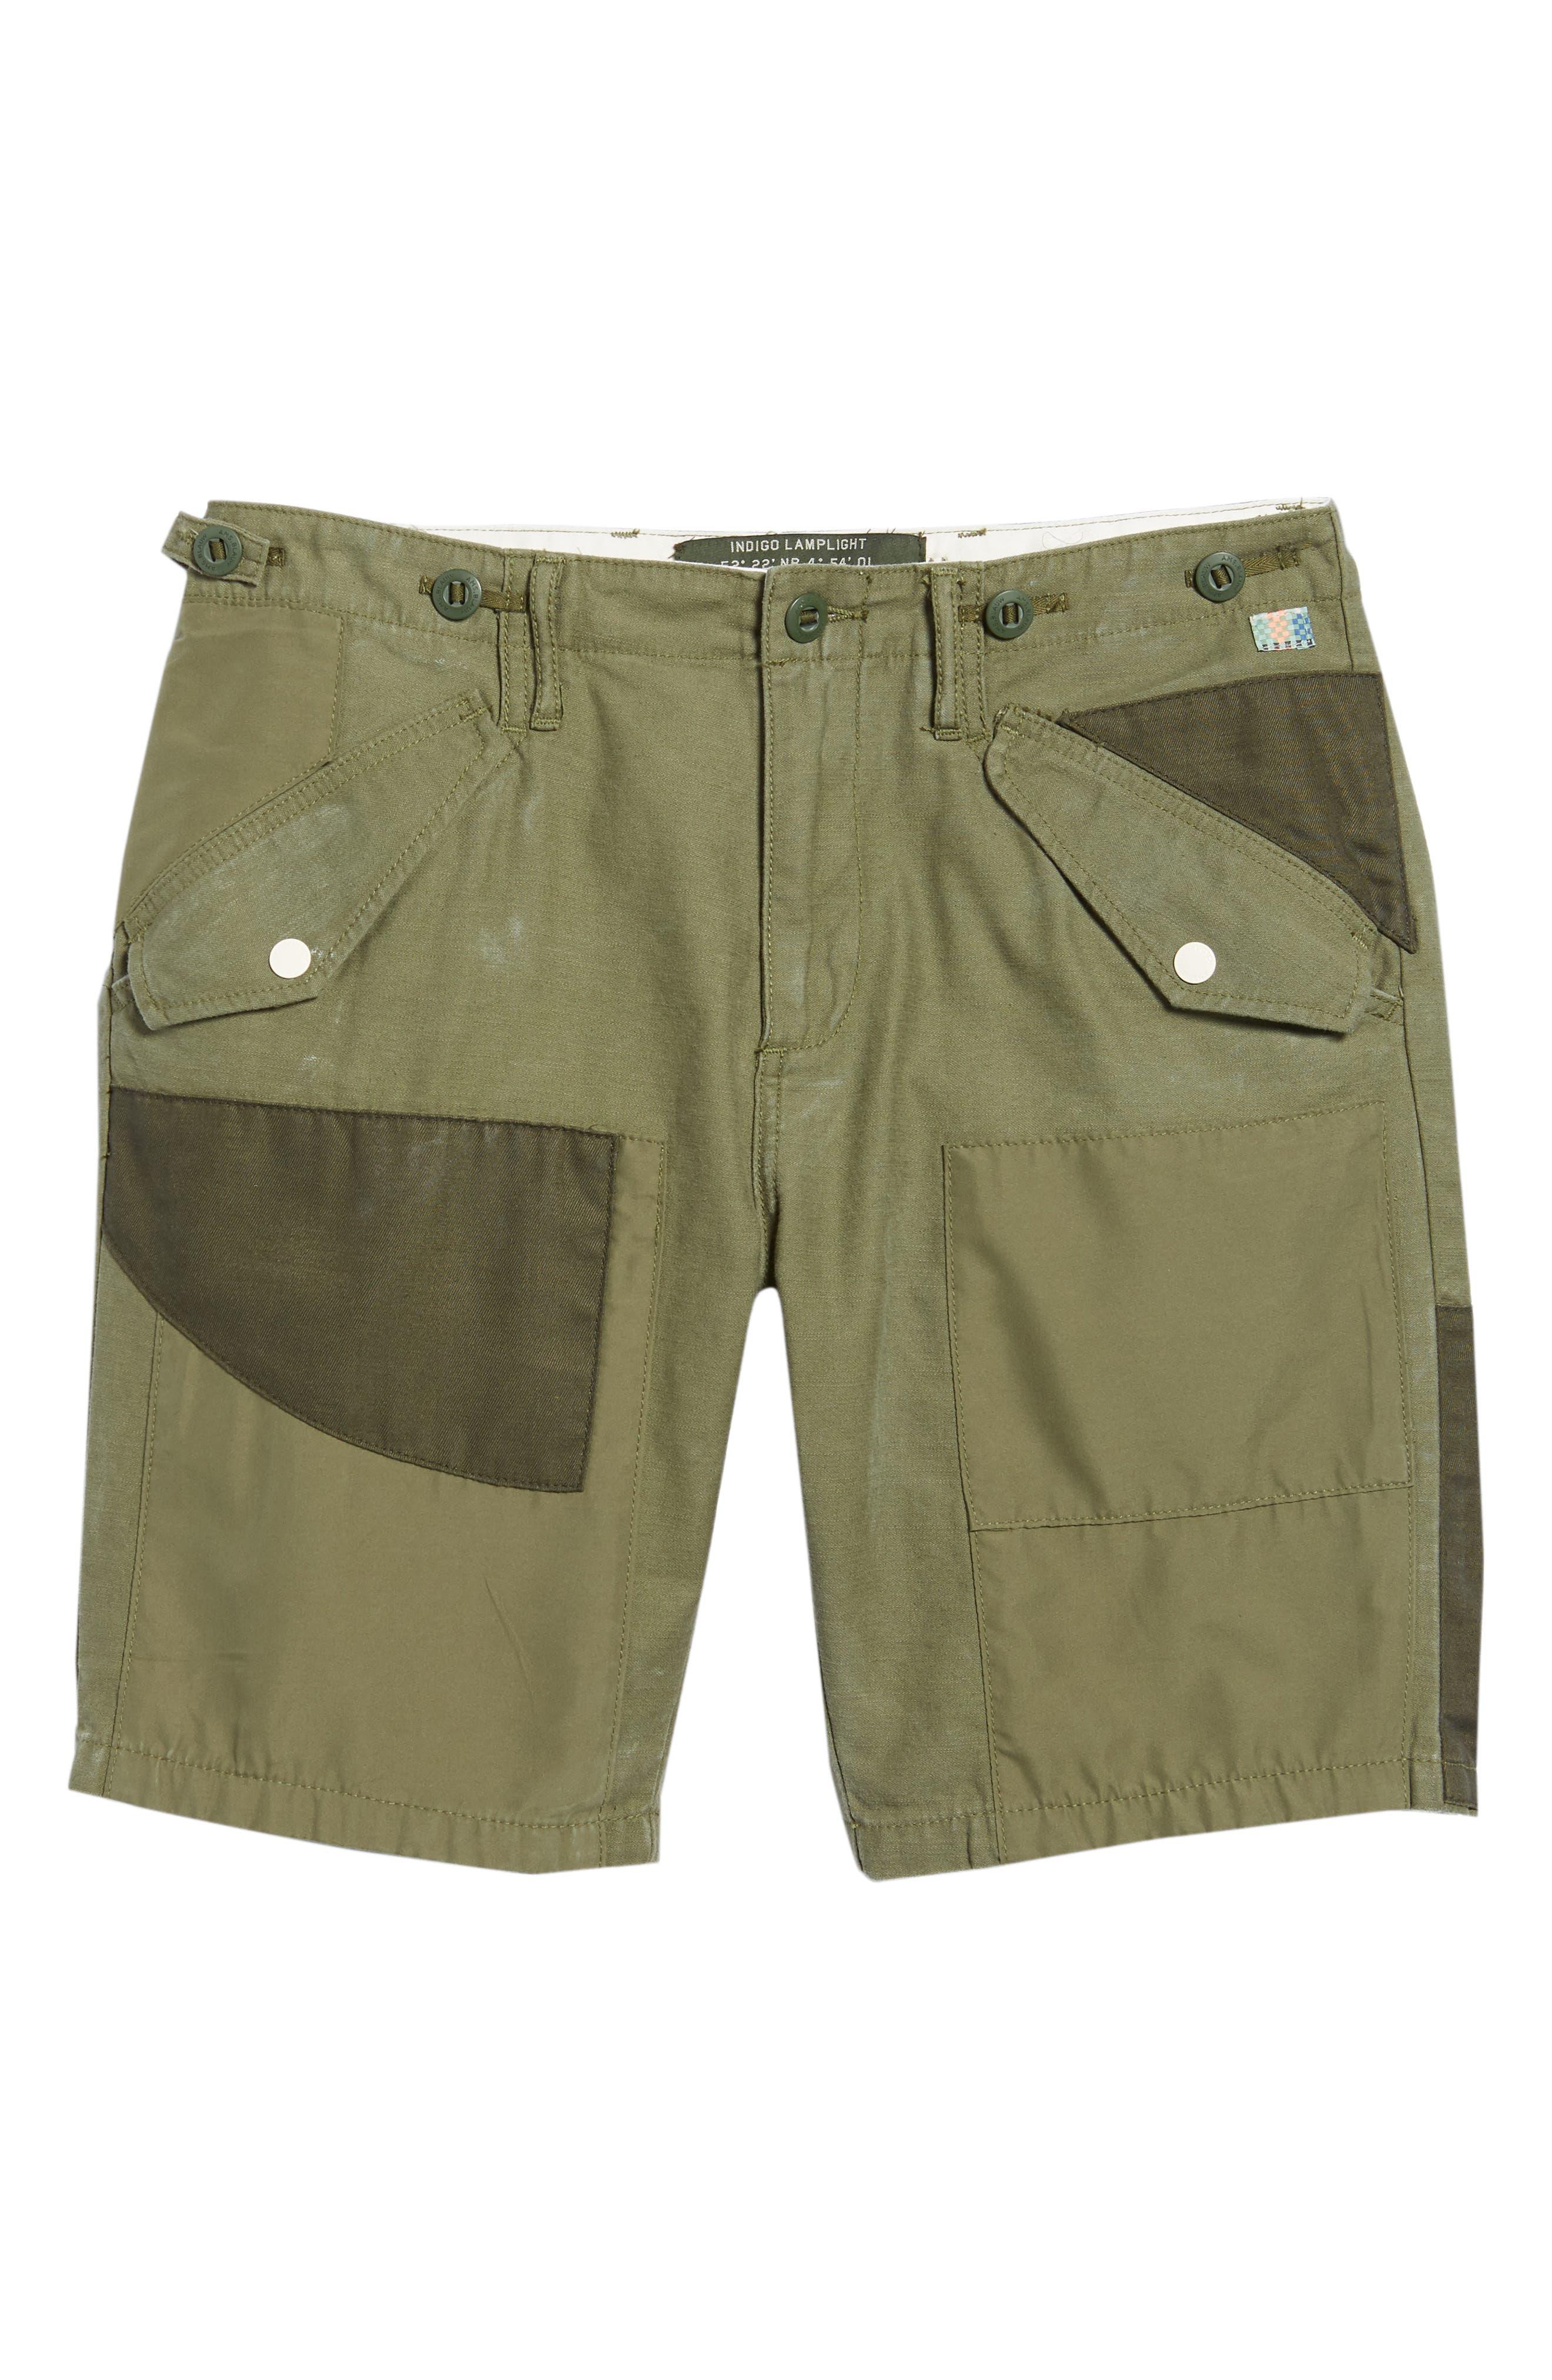 Cargo Shorts,                             Alternate thumbnail 6, color,                             GREEN